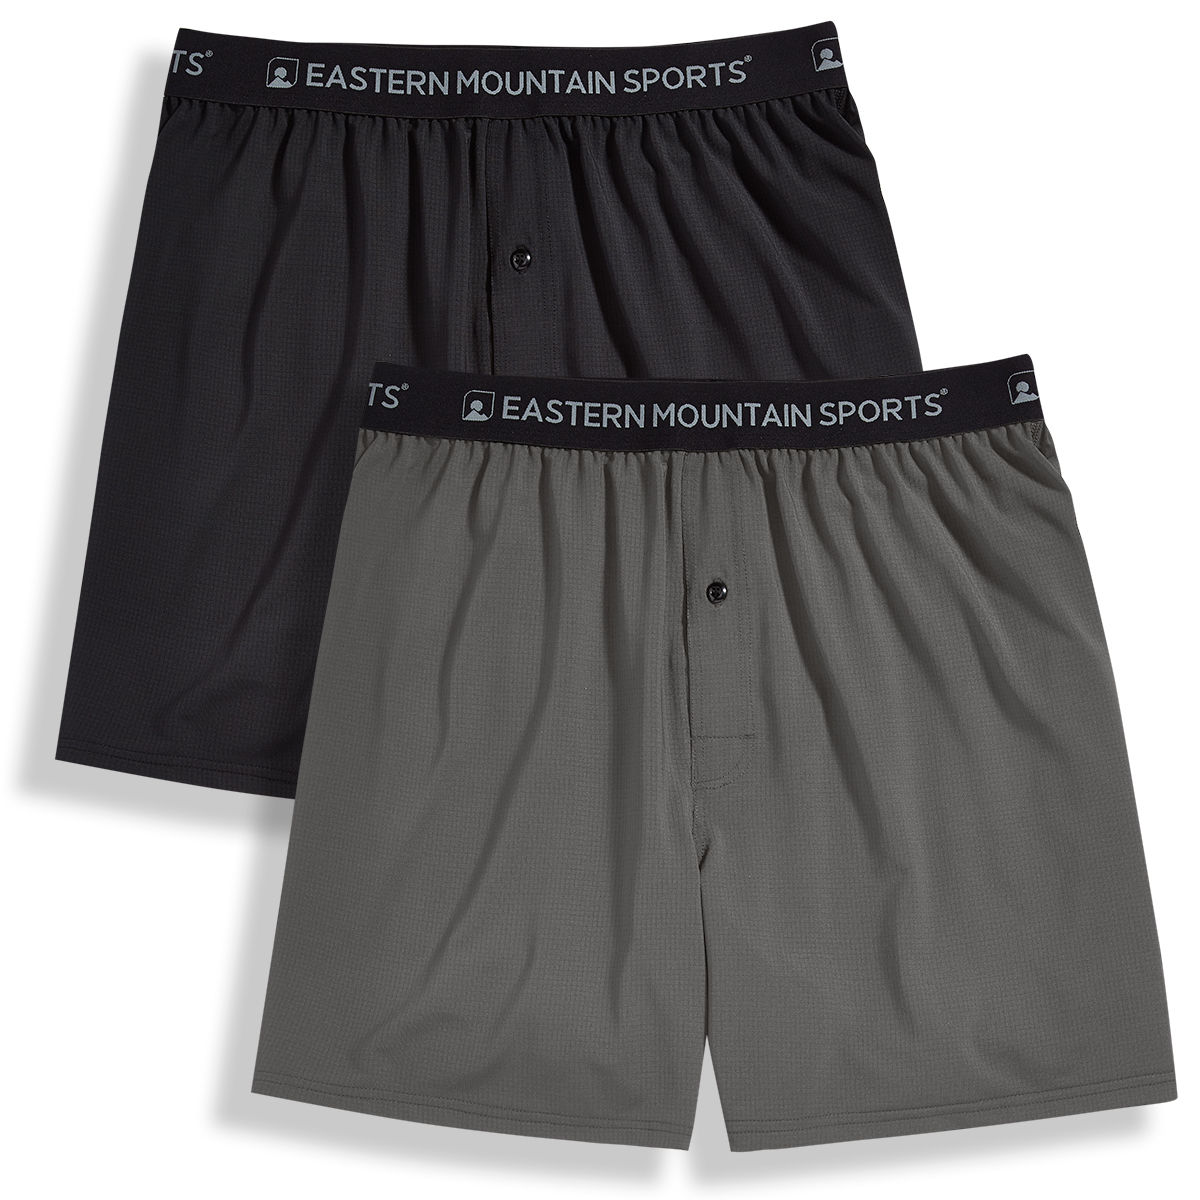 Ems Men's Techwick Boxers, 2-Pack - Black, L